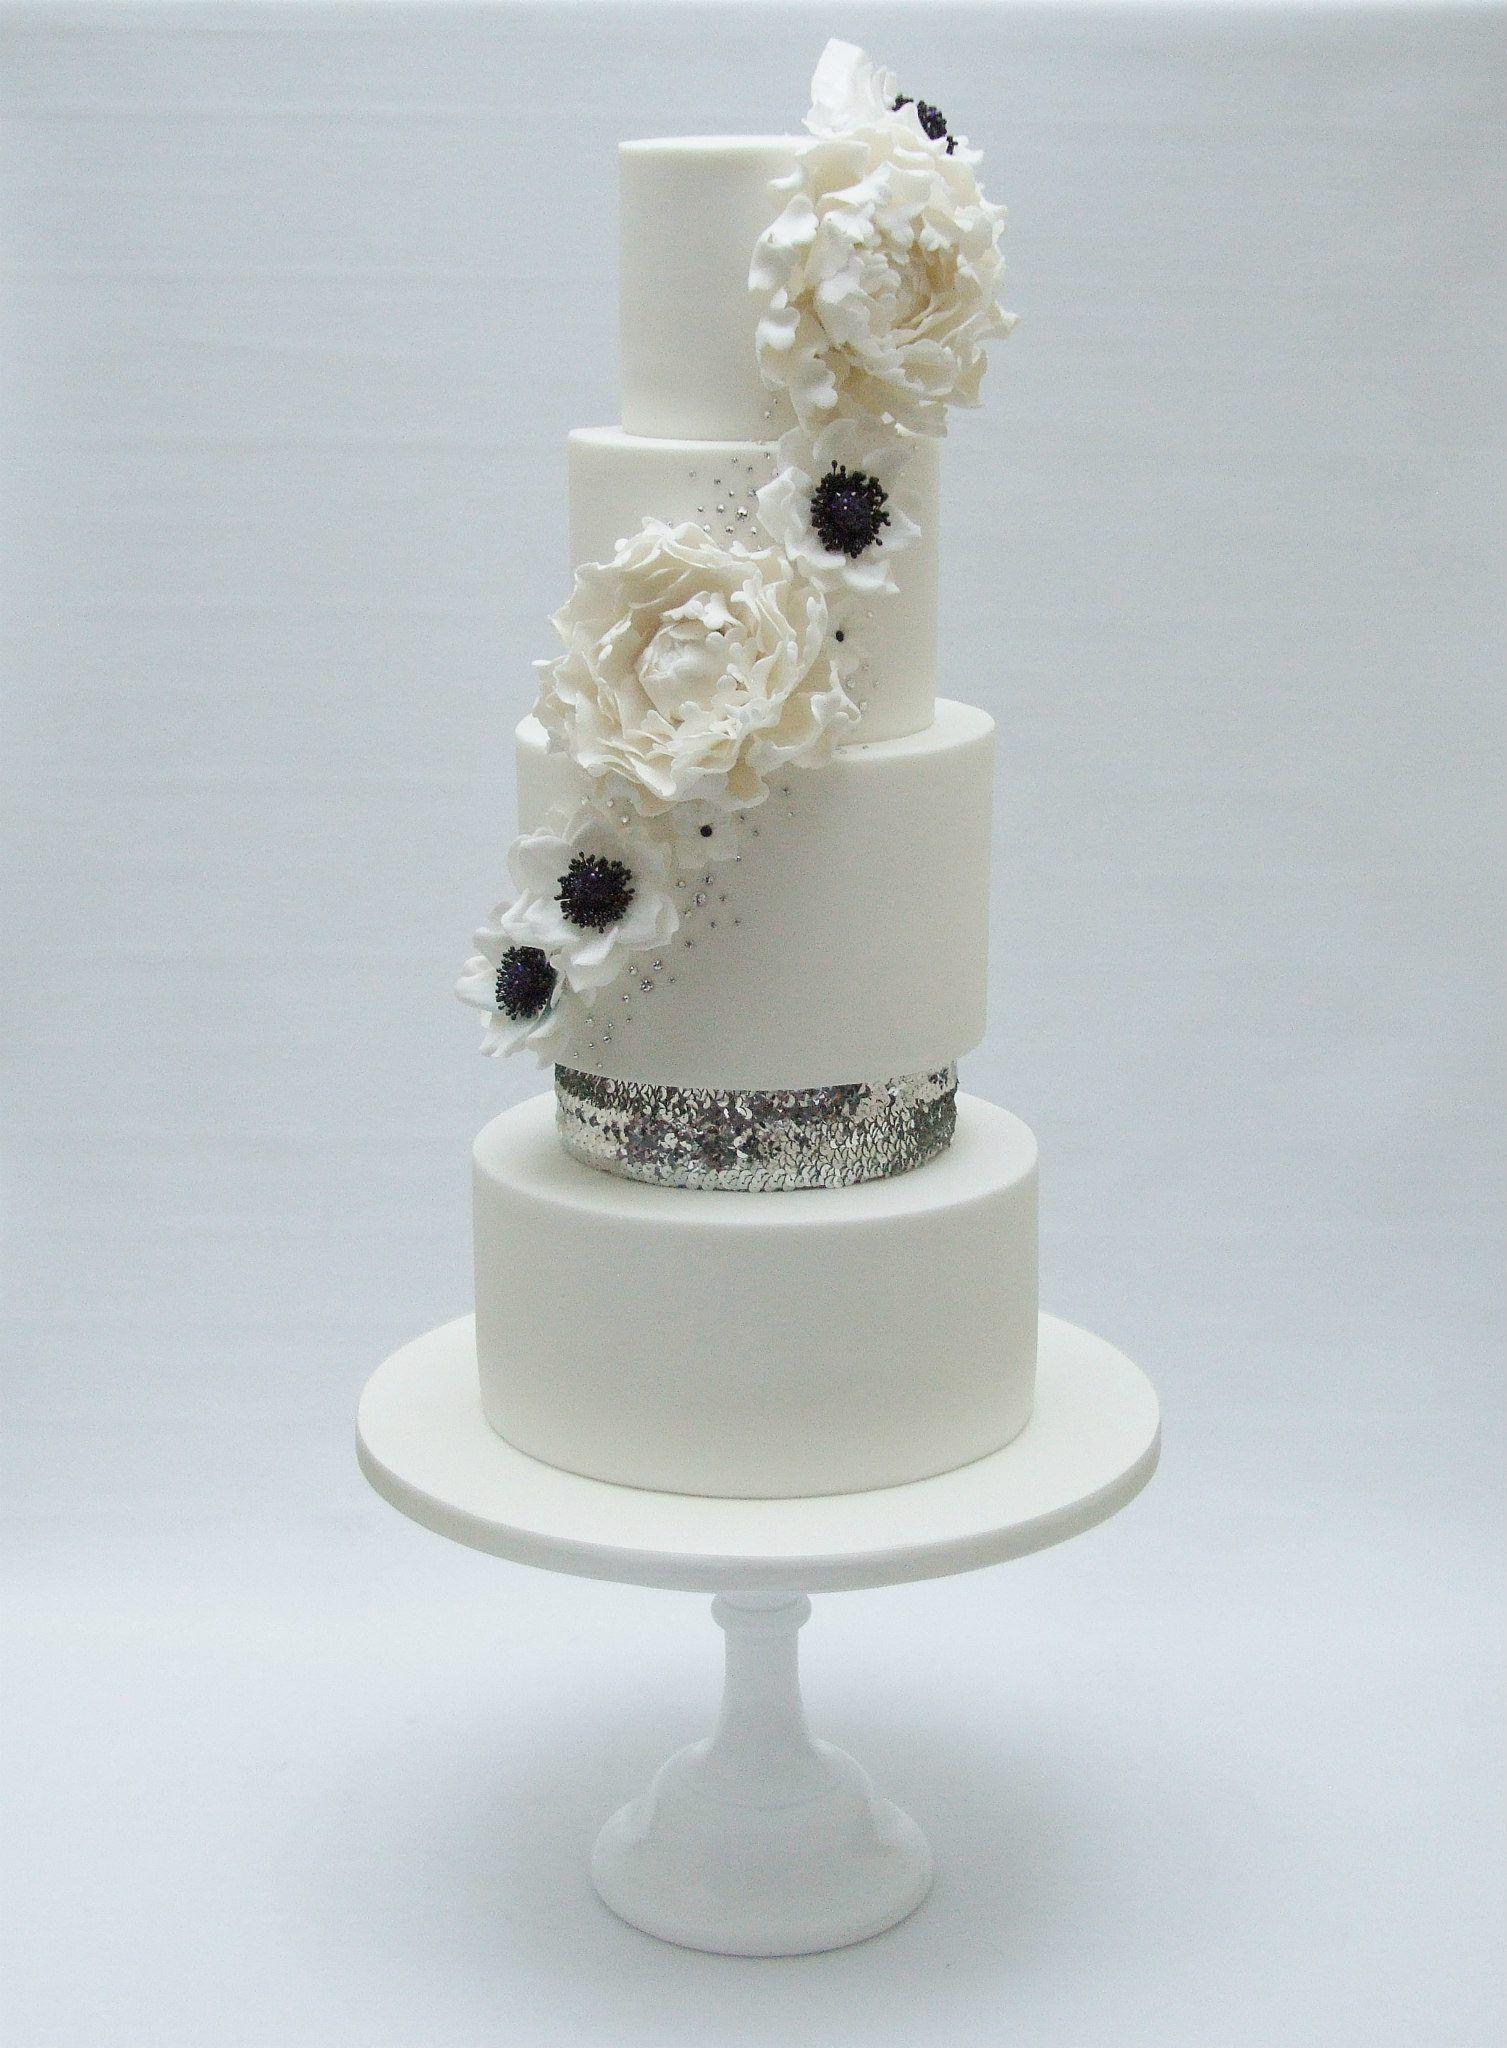 Emma Jayne Cake Design | Wedding Cakes | Pinterest | Cake designs ...